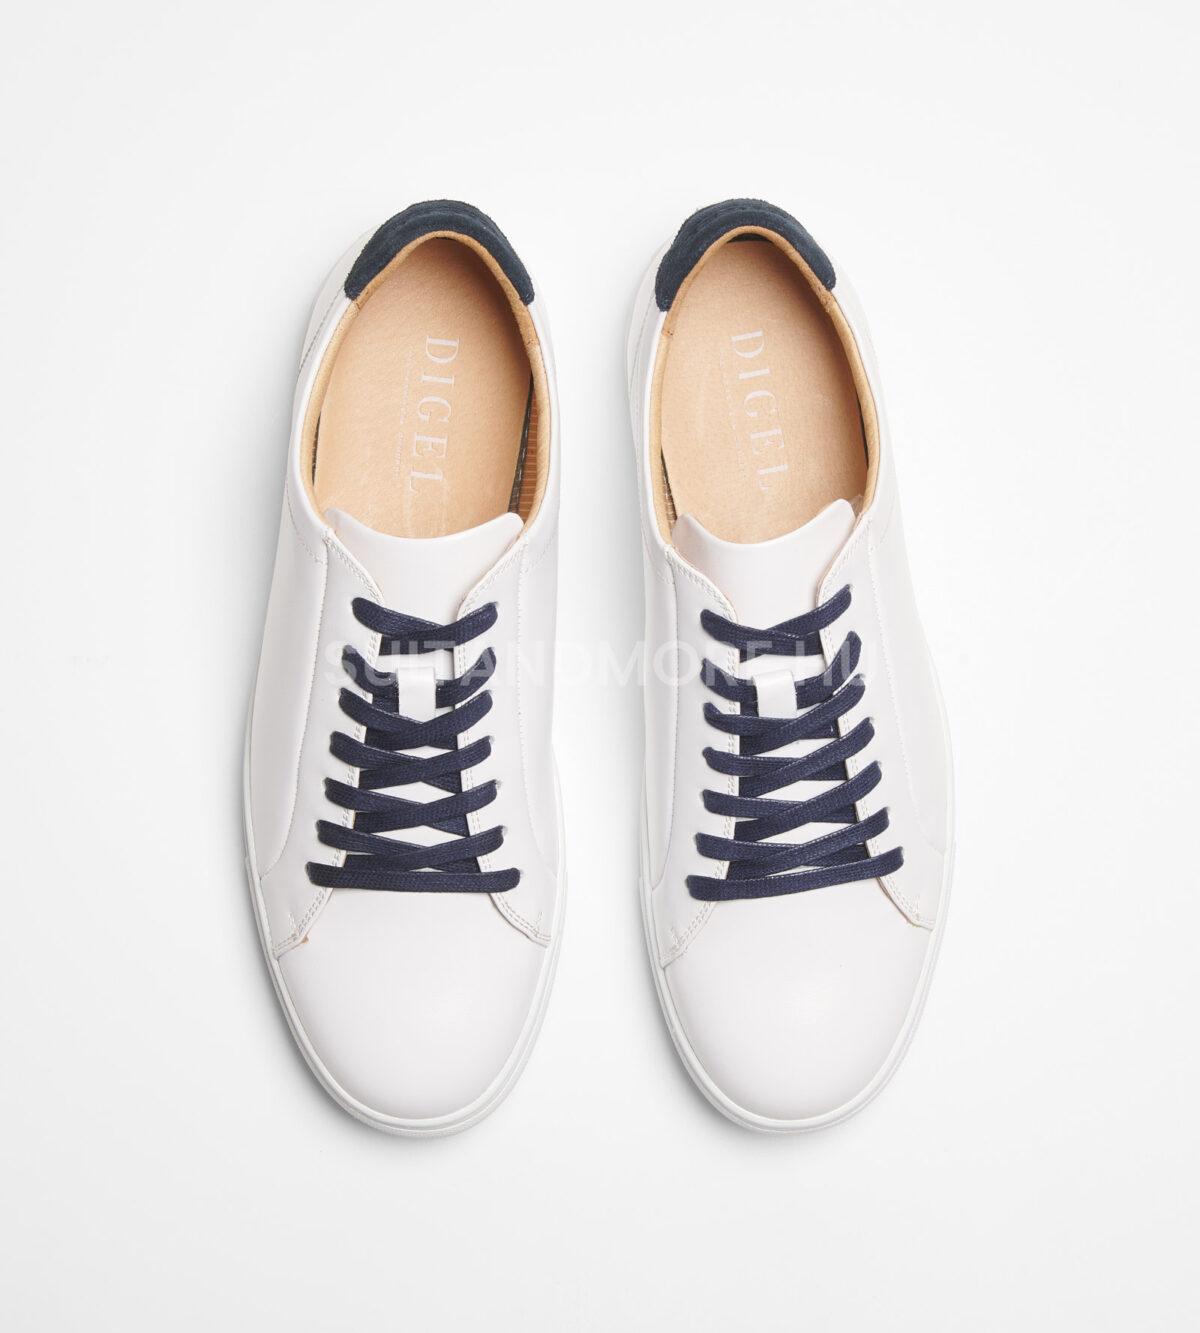 digel-feher-sneaker-cipo-seth-1199716-80-04